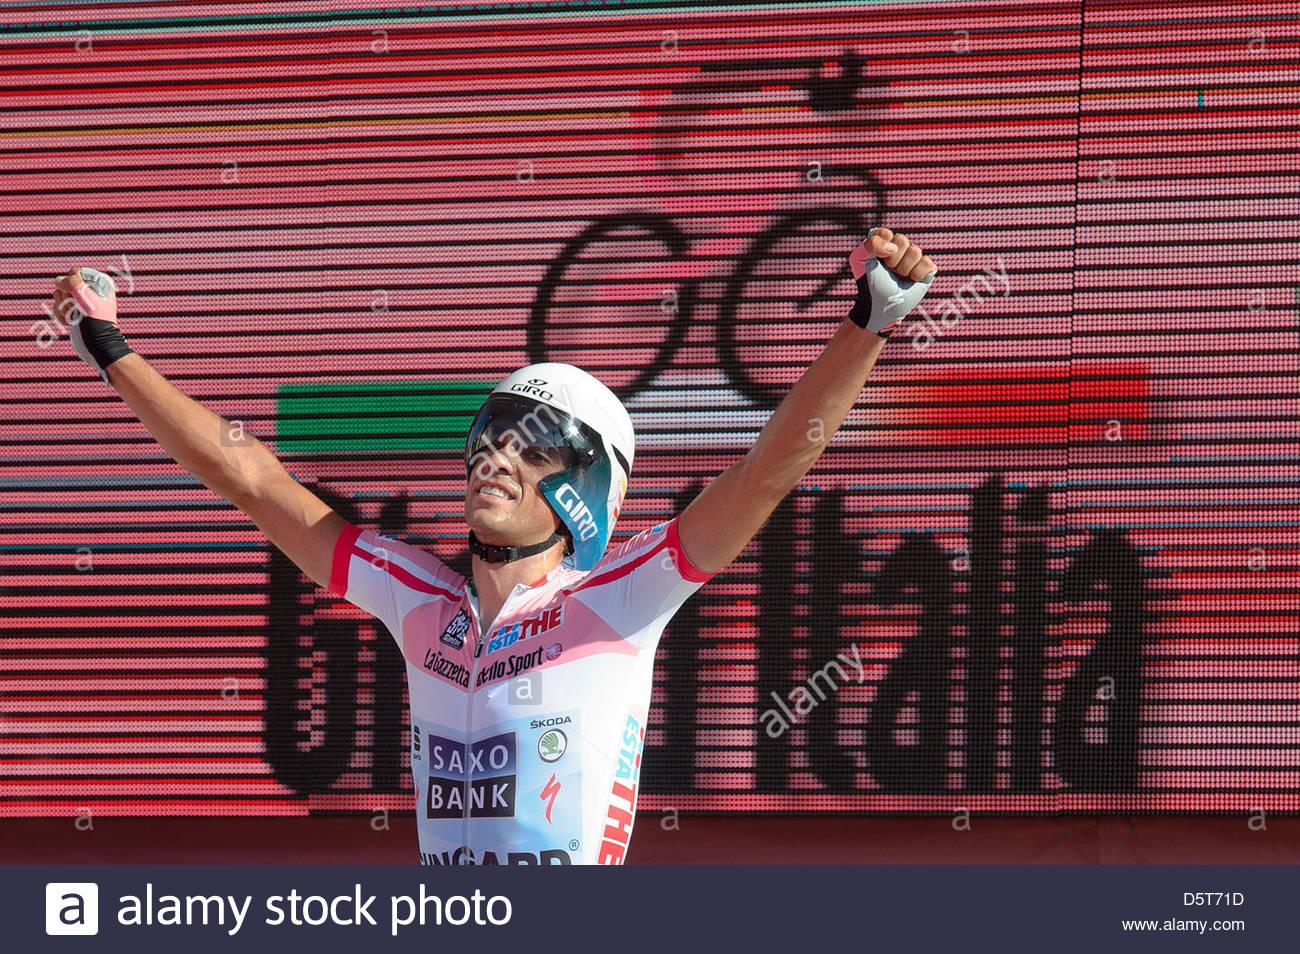 Alberto Contador, ganador del Giro d'Italia 2011 Imagen De Stock